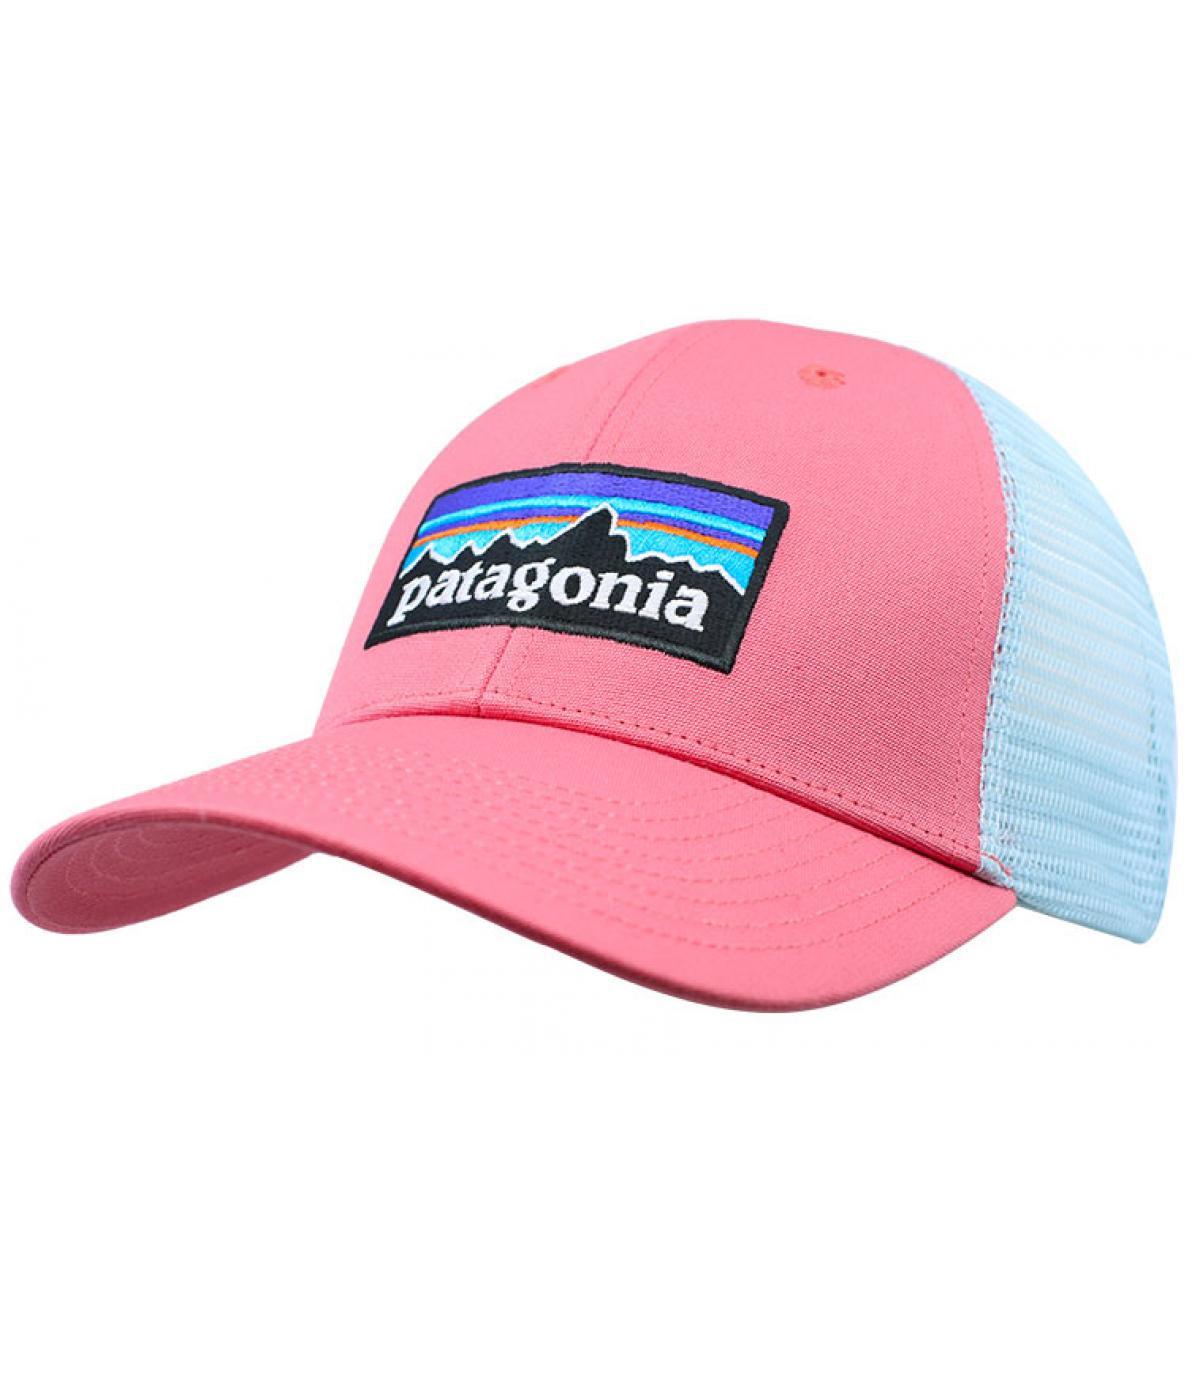 Dettagli P6 Logo Trucker LoPro sticker pink - image 2